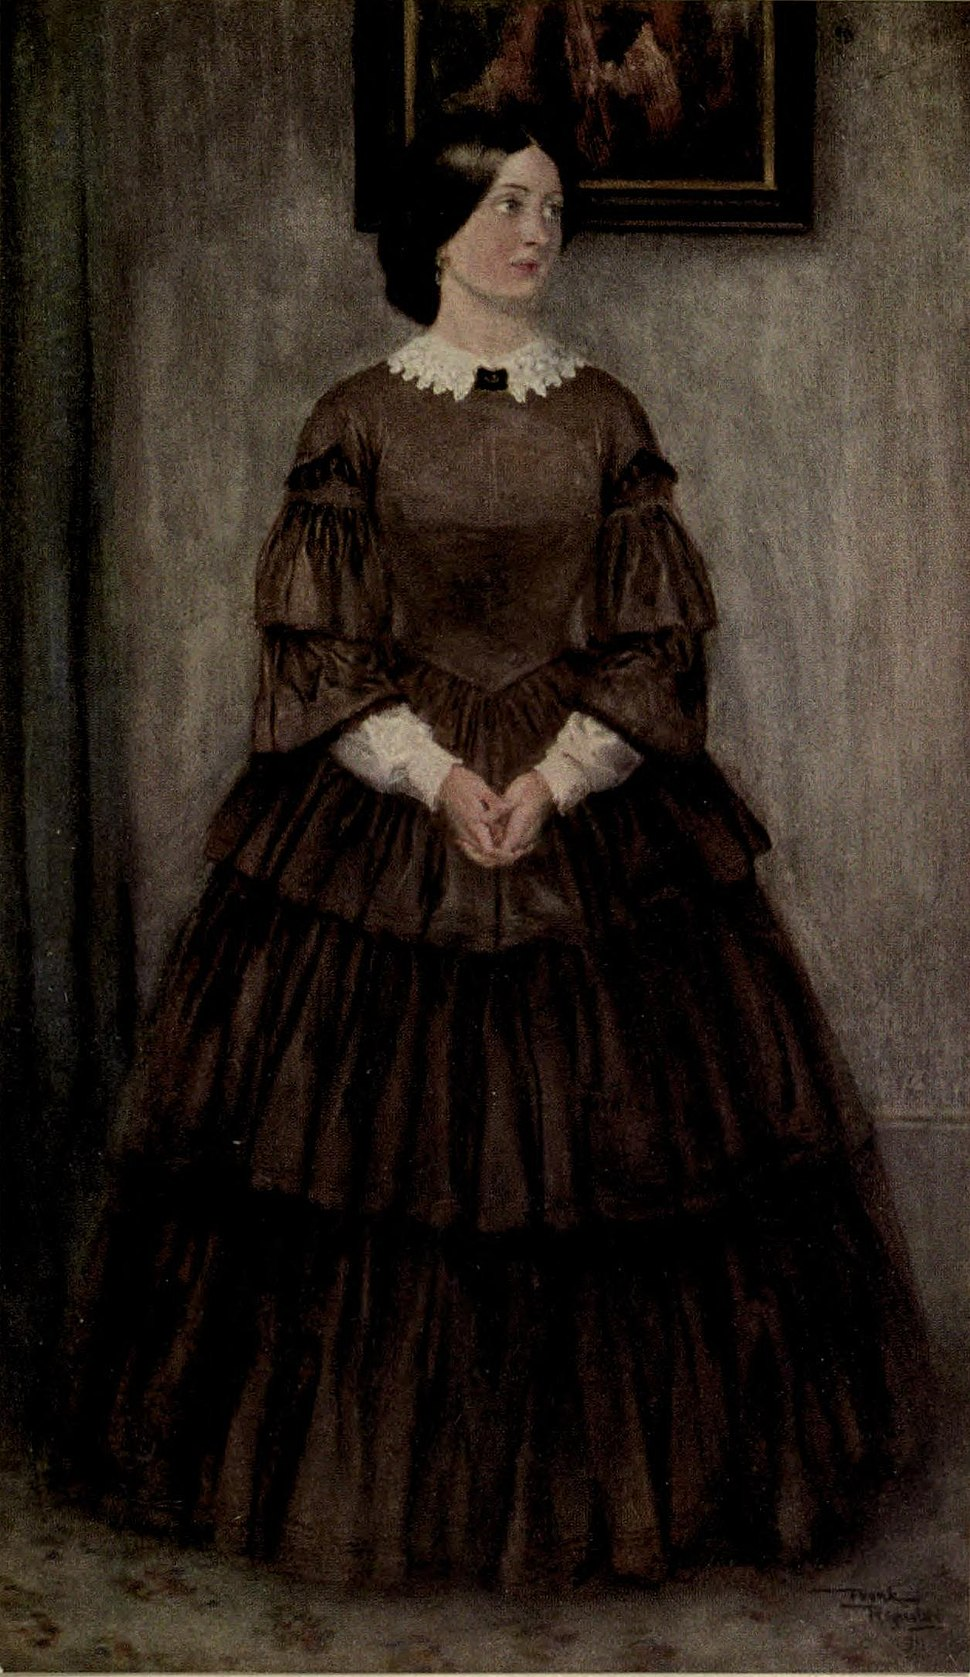 Agnes Wickfield from David Copperfield art by Frank Reynolds